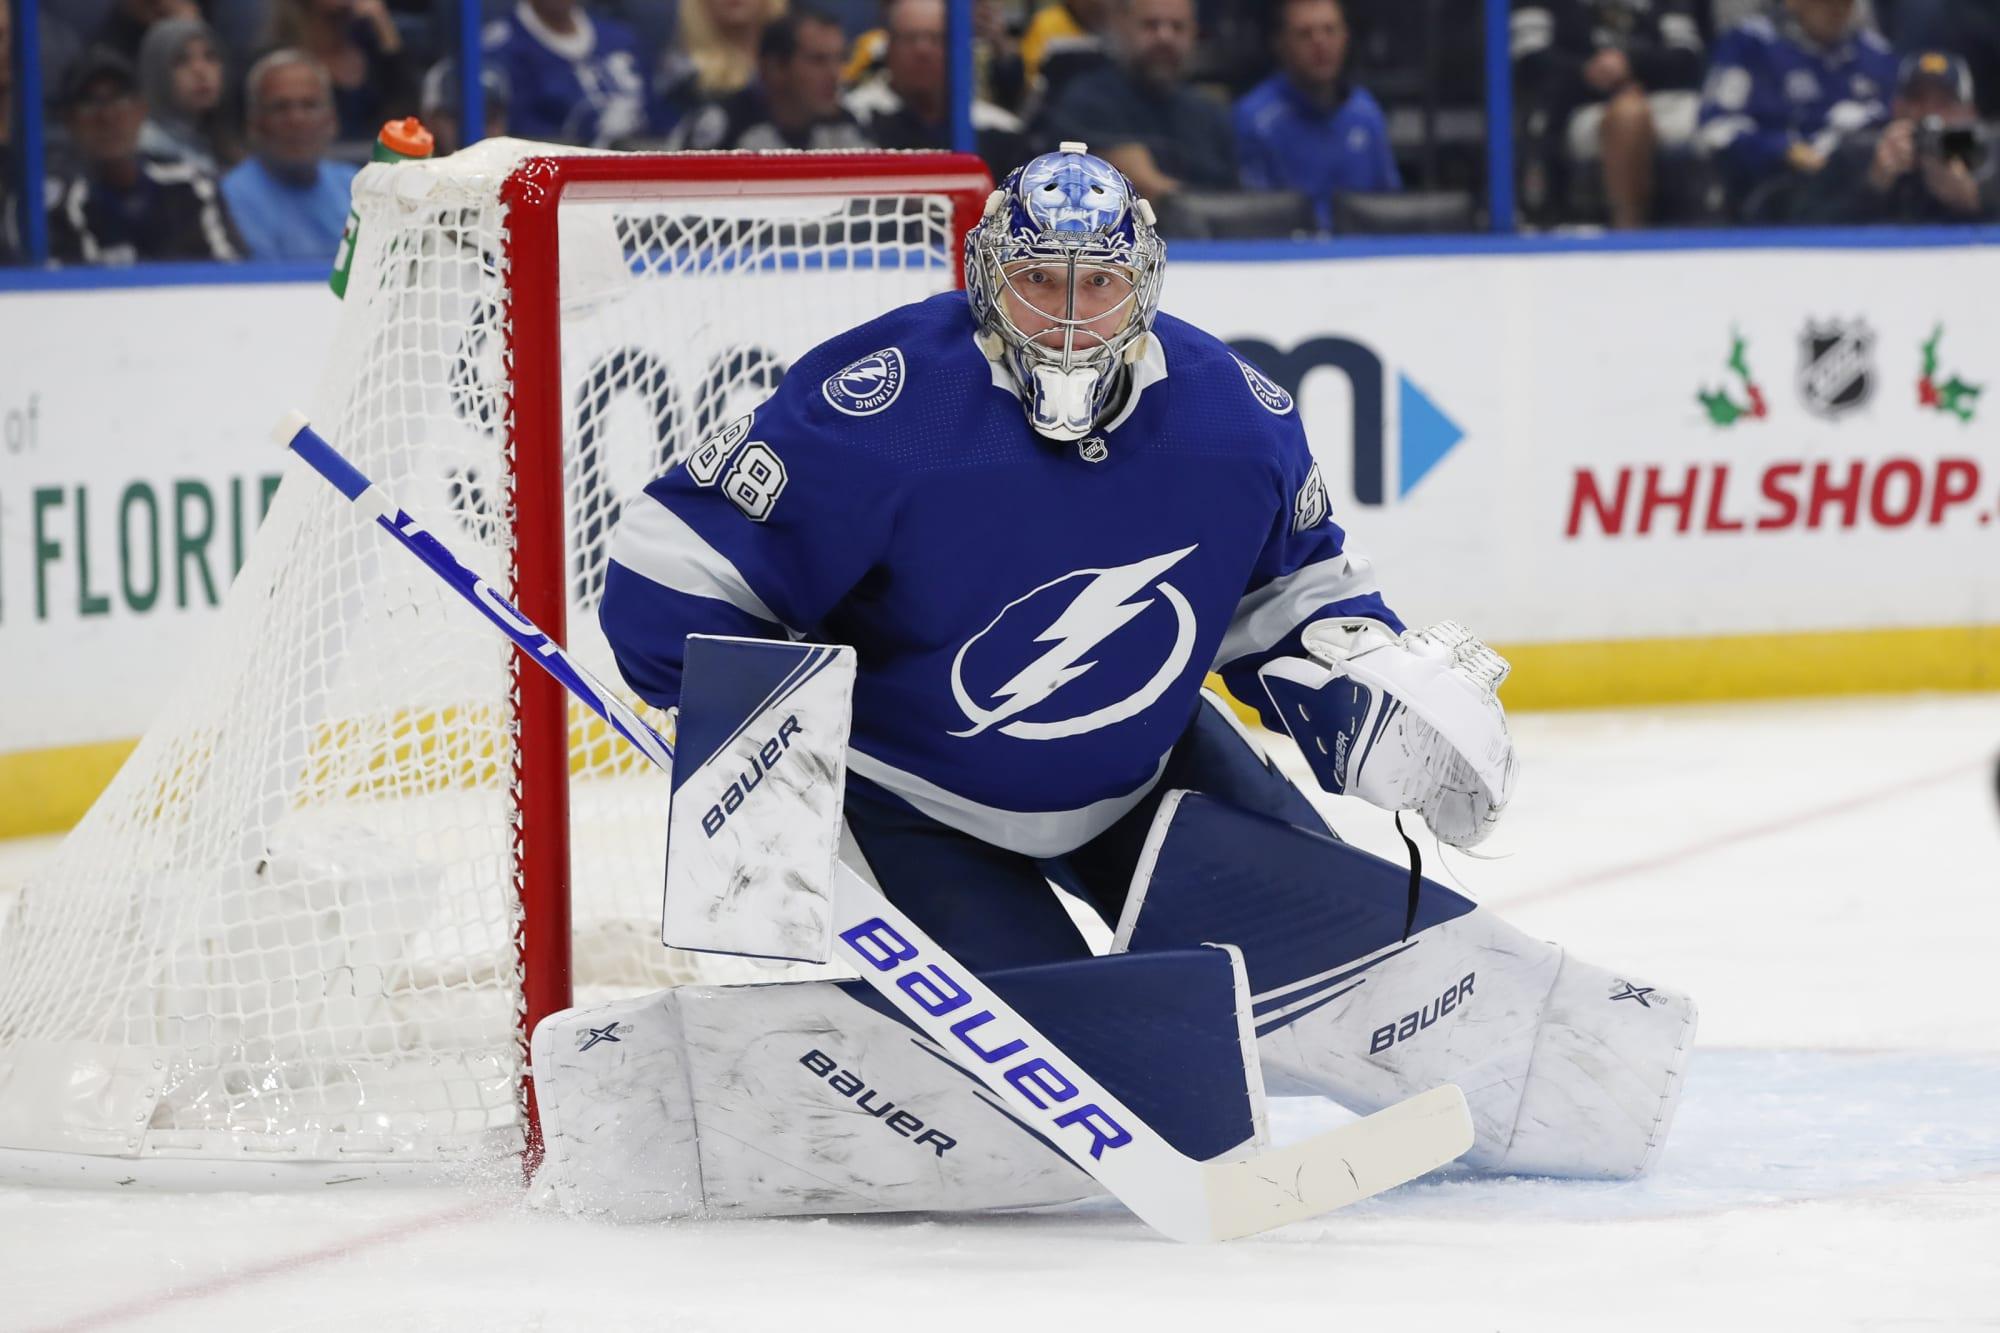 NHL: Ranking the starting goaltenders of the Atlantic Division